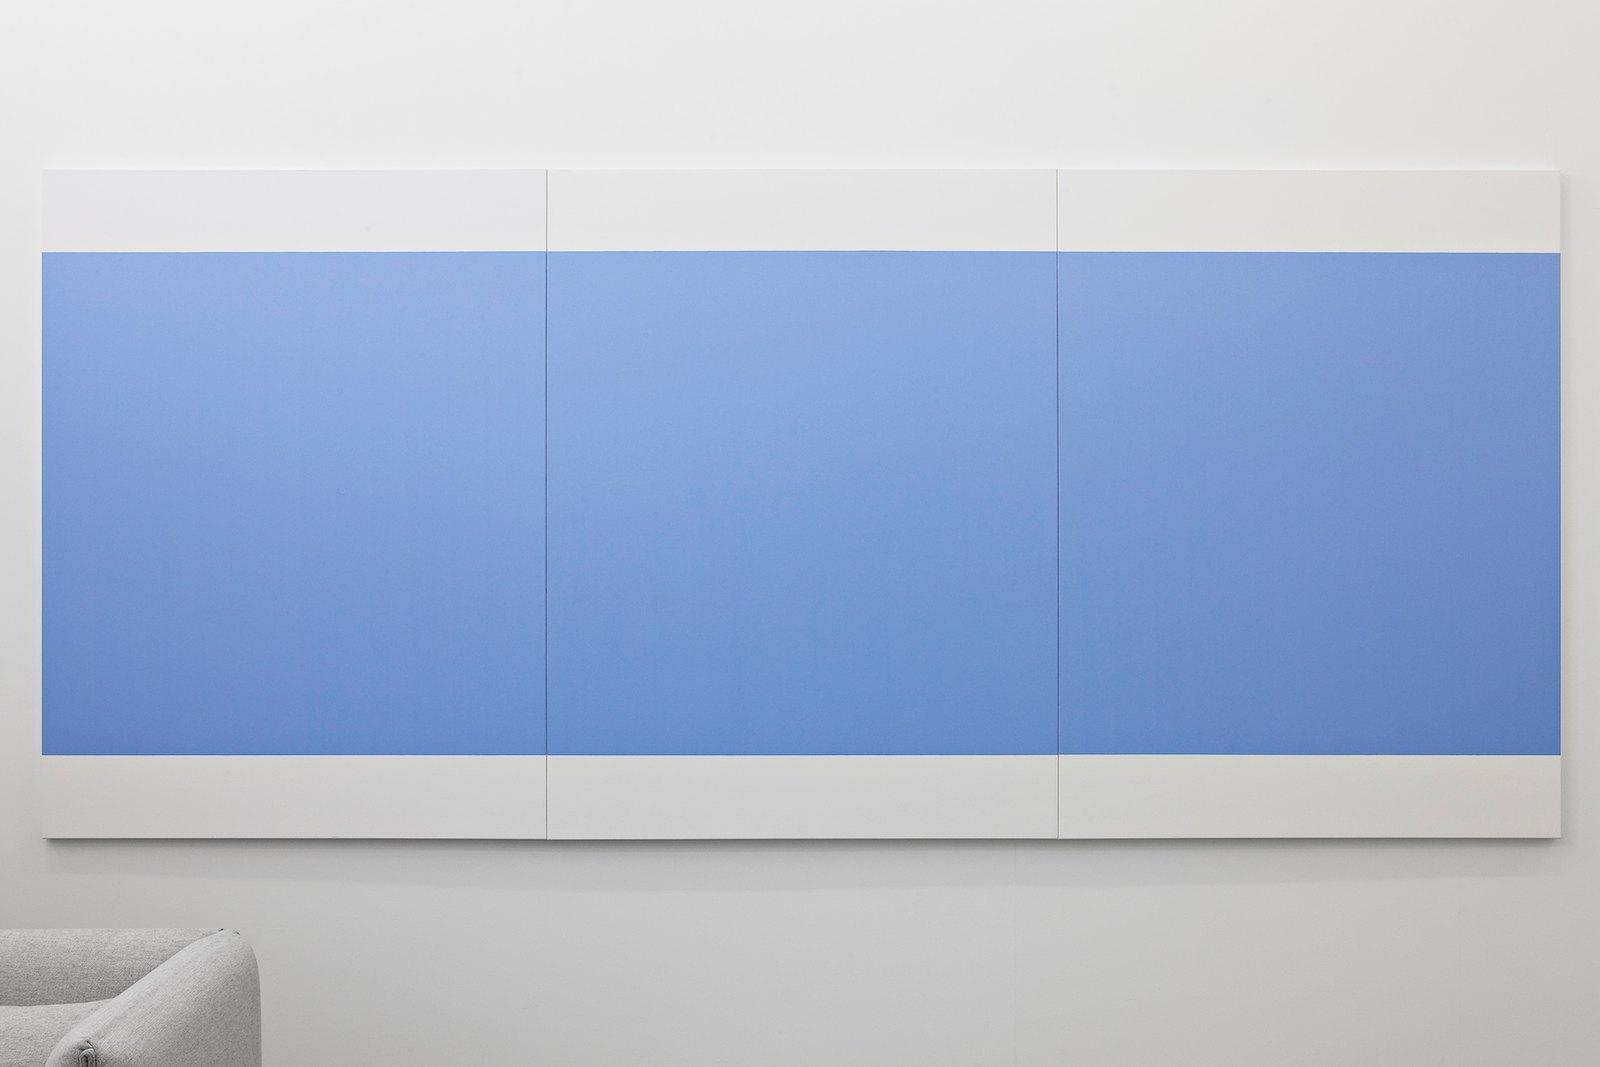 Three cobalt blue squares (blue band), 2007-2009, oil on canvas, 180 x 405 cm (3 parts)